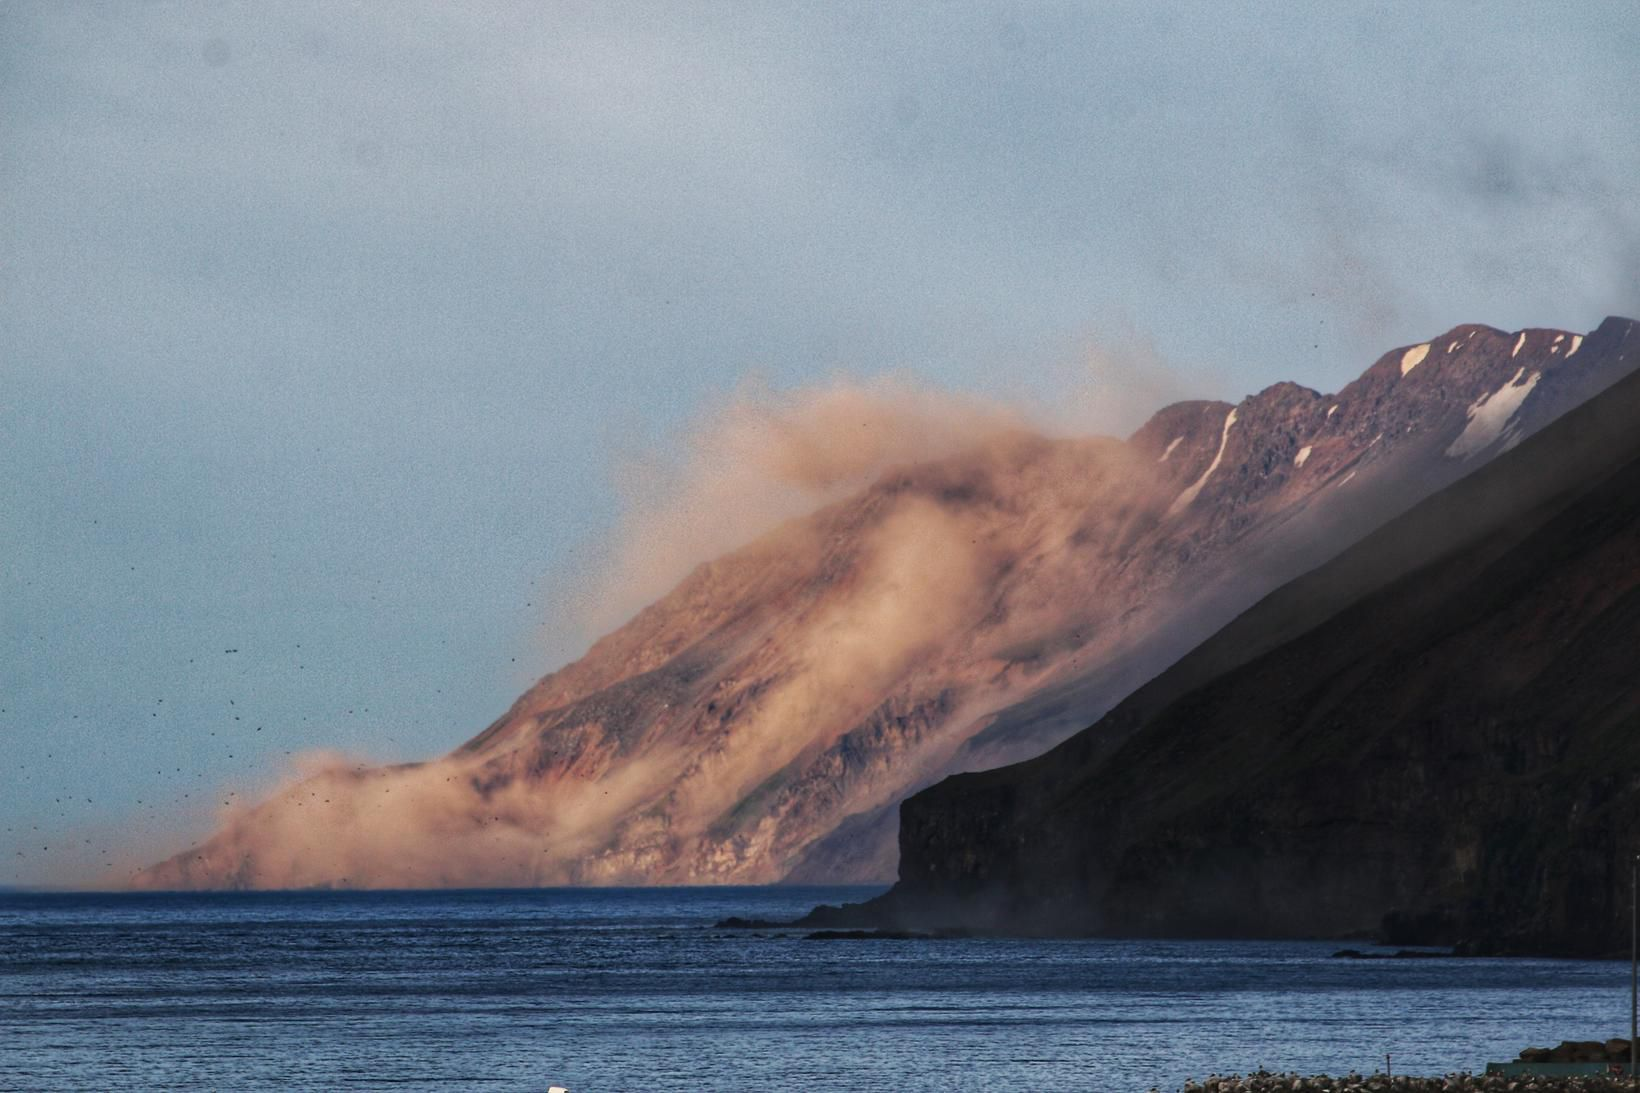 Após coronavírus, Islândia liga alerta para vulcão e terremotos